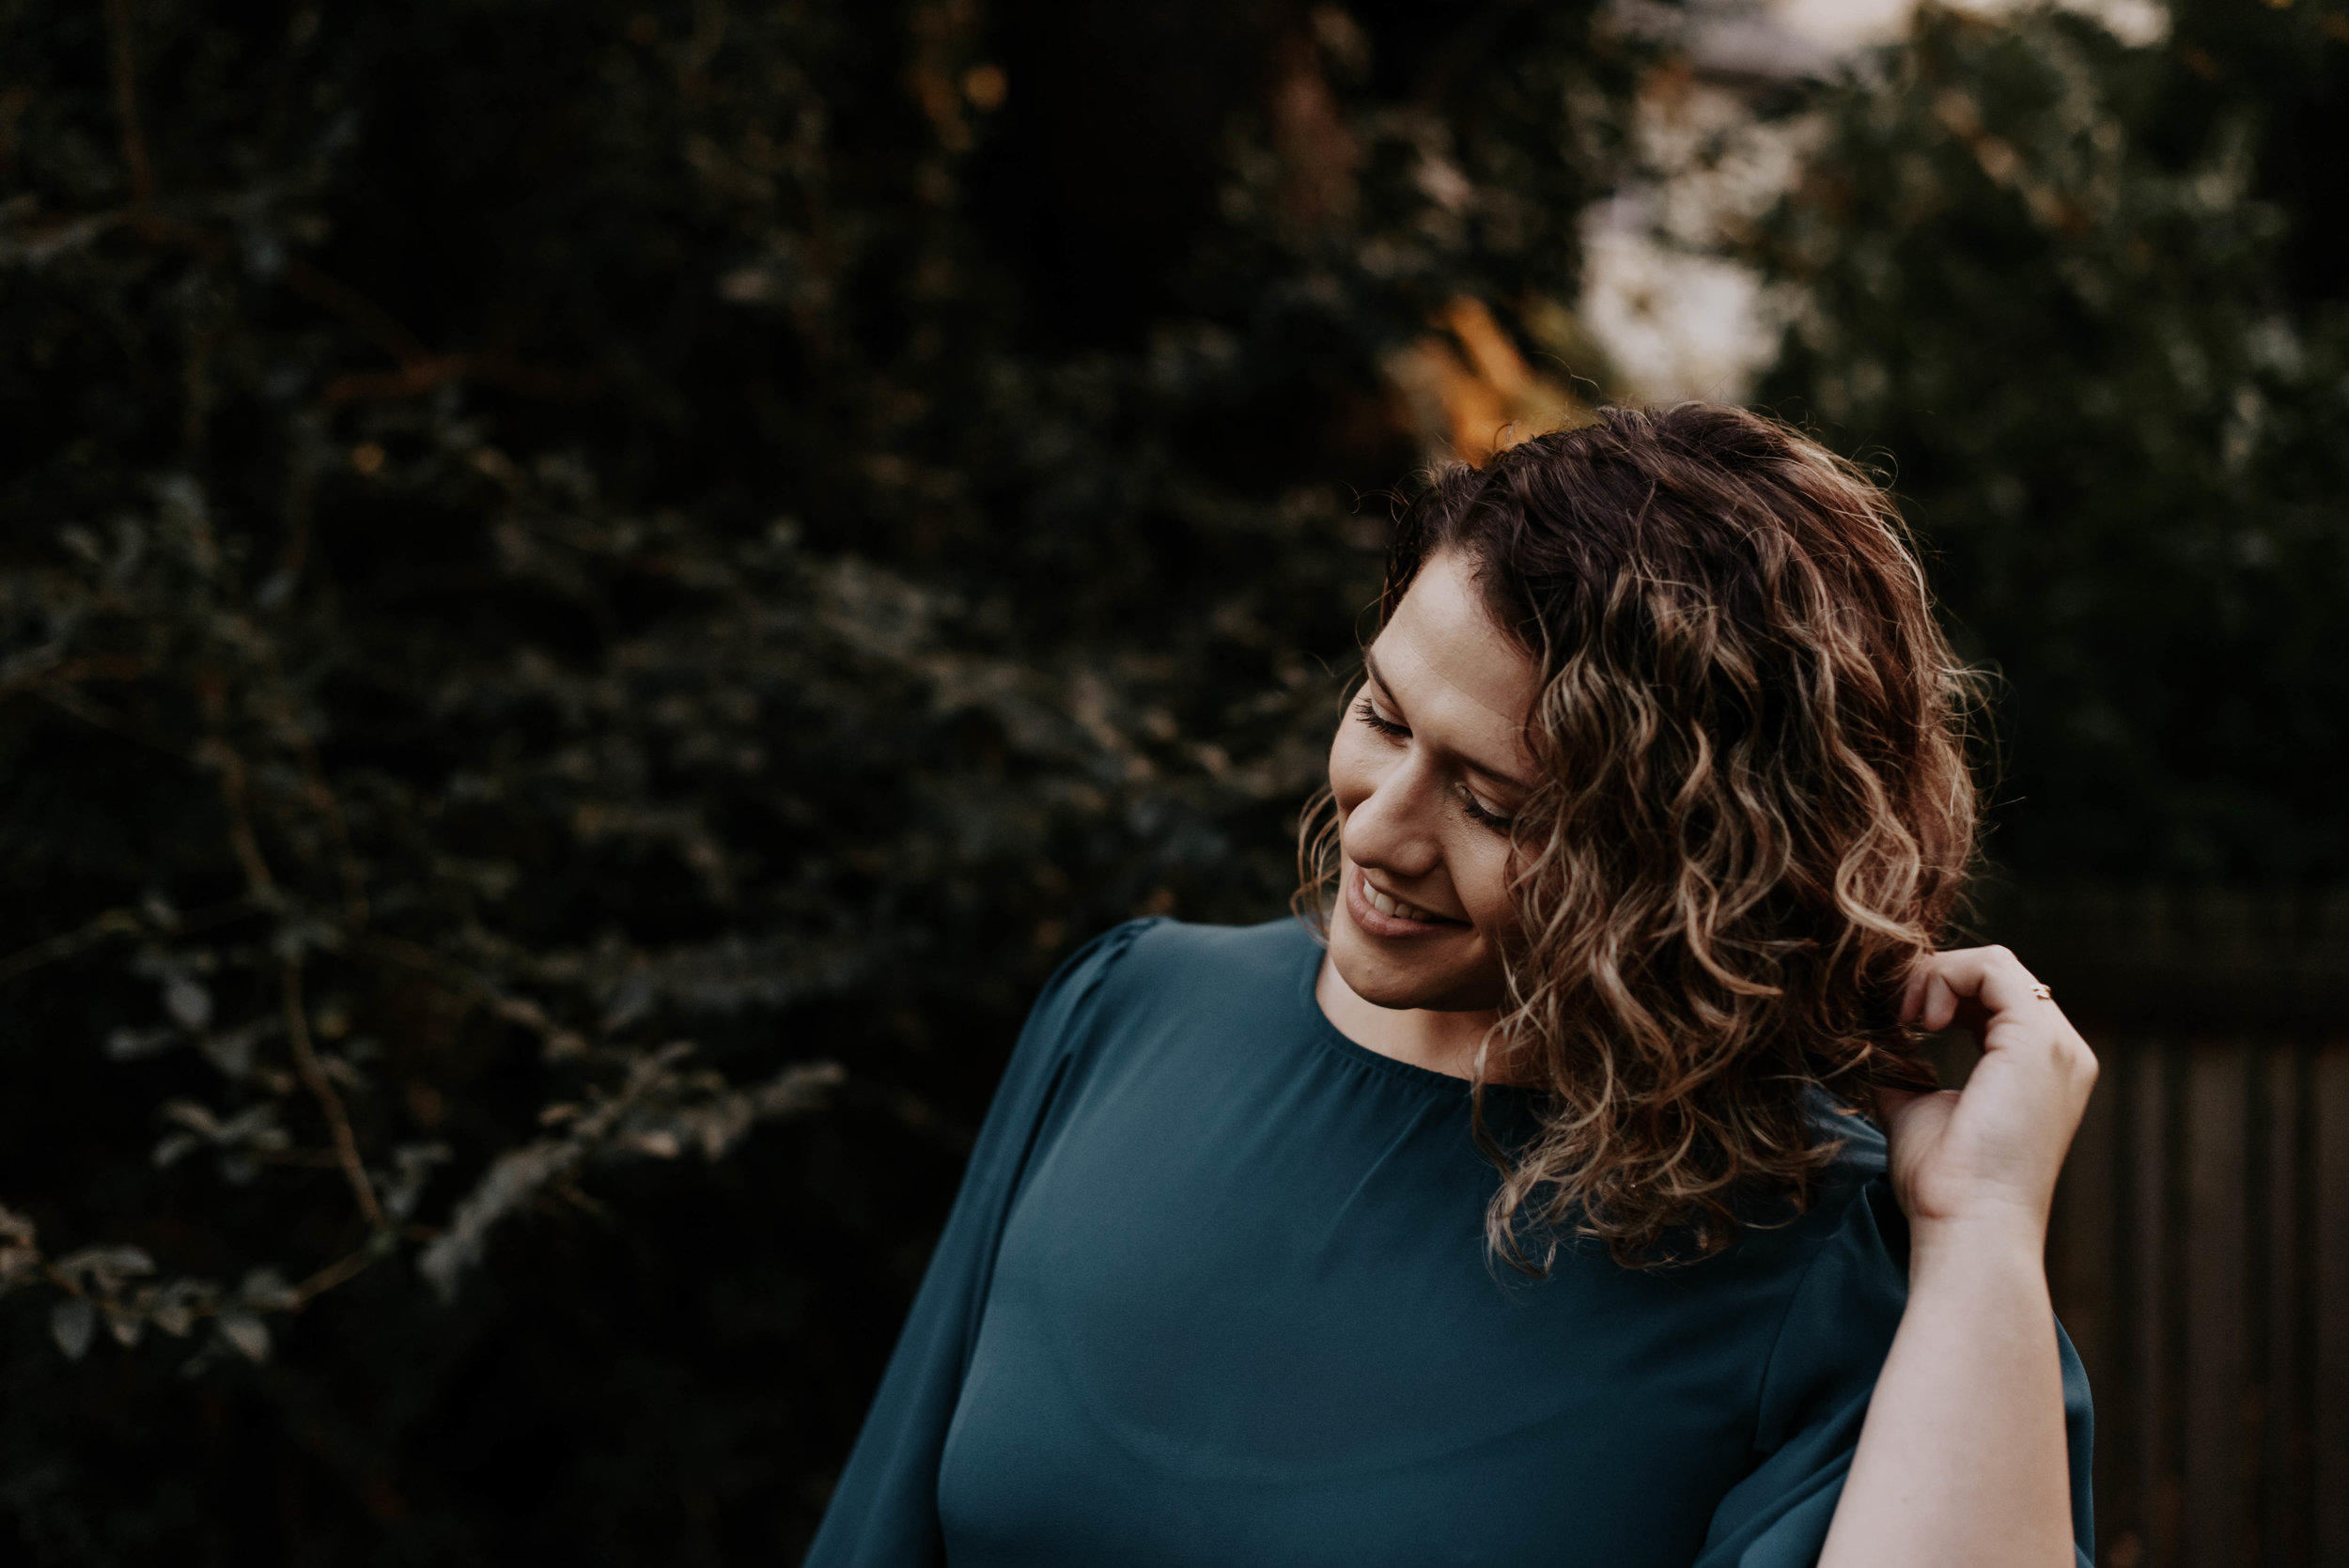 Erin-Kirkpatrick-Photography-Victoria-Graduation-Oct-2017-97.jpg